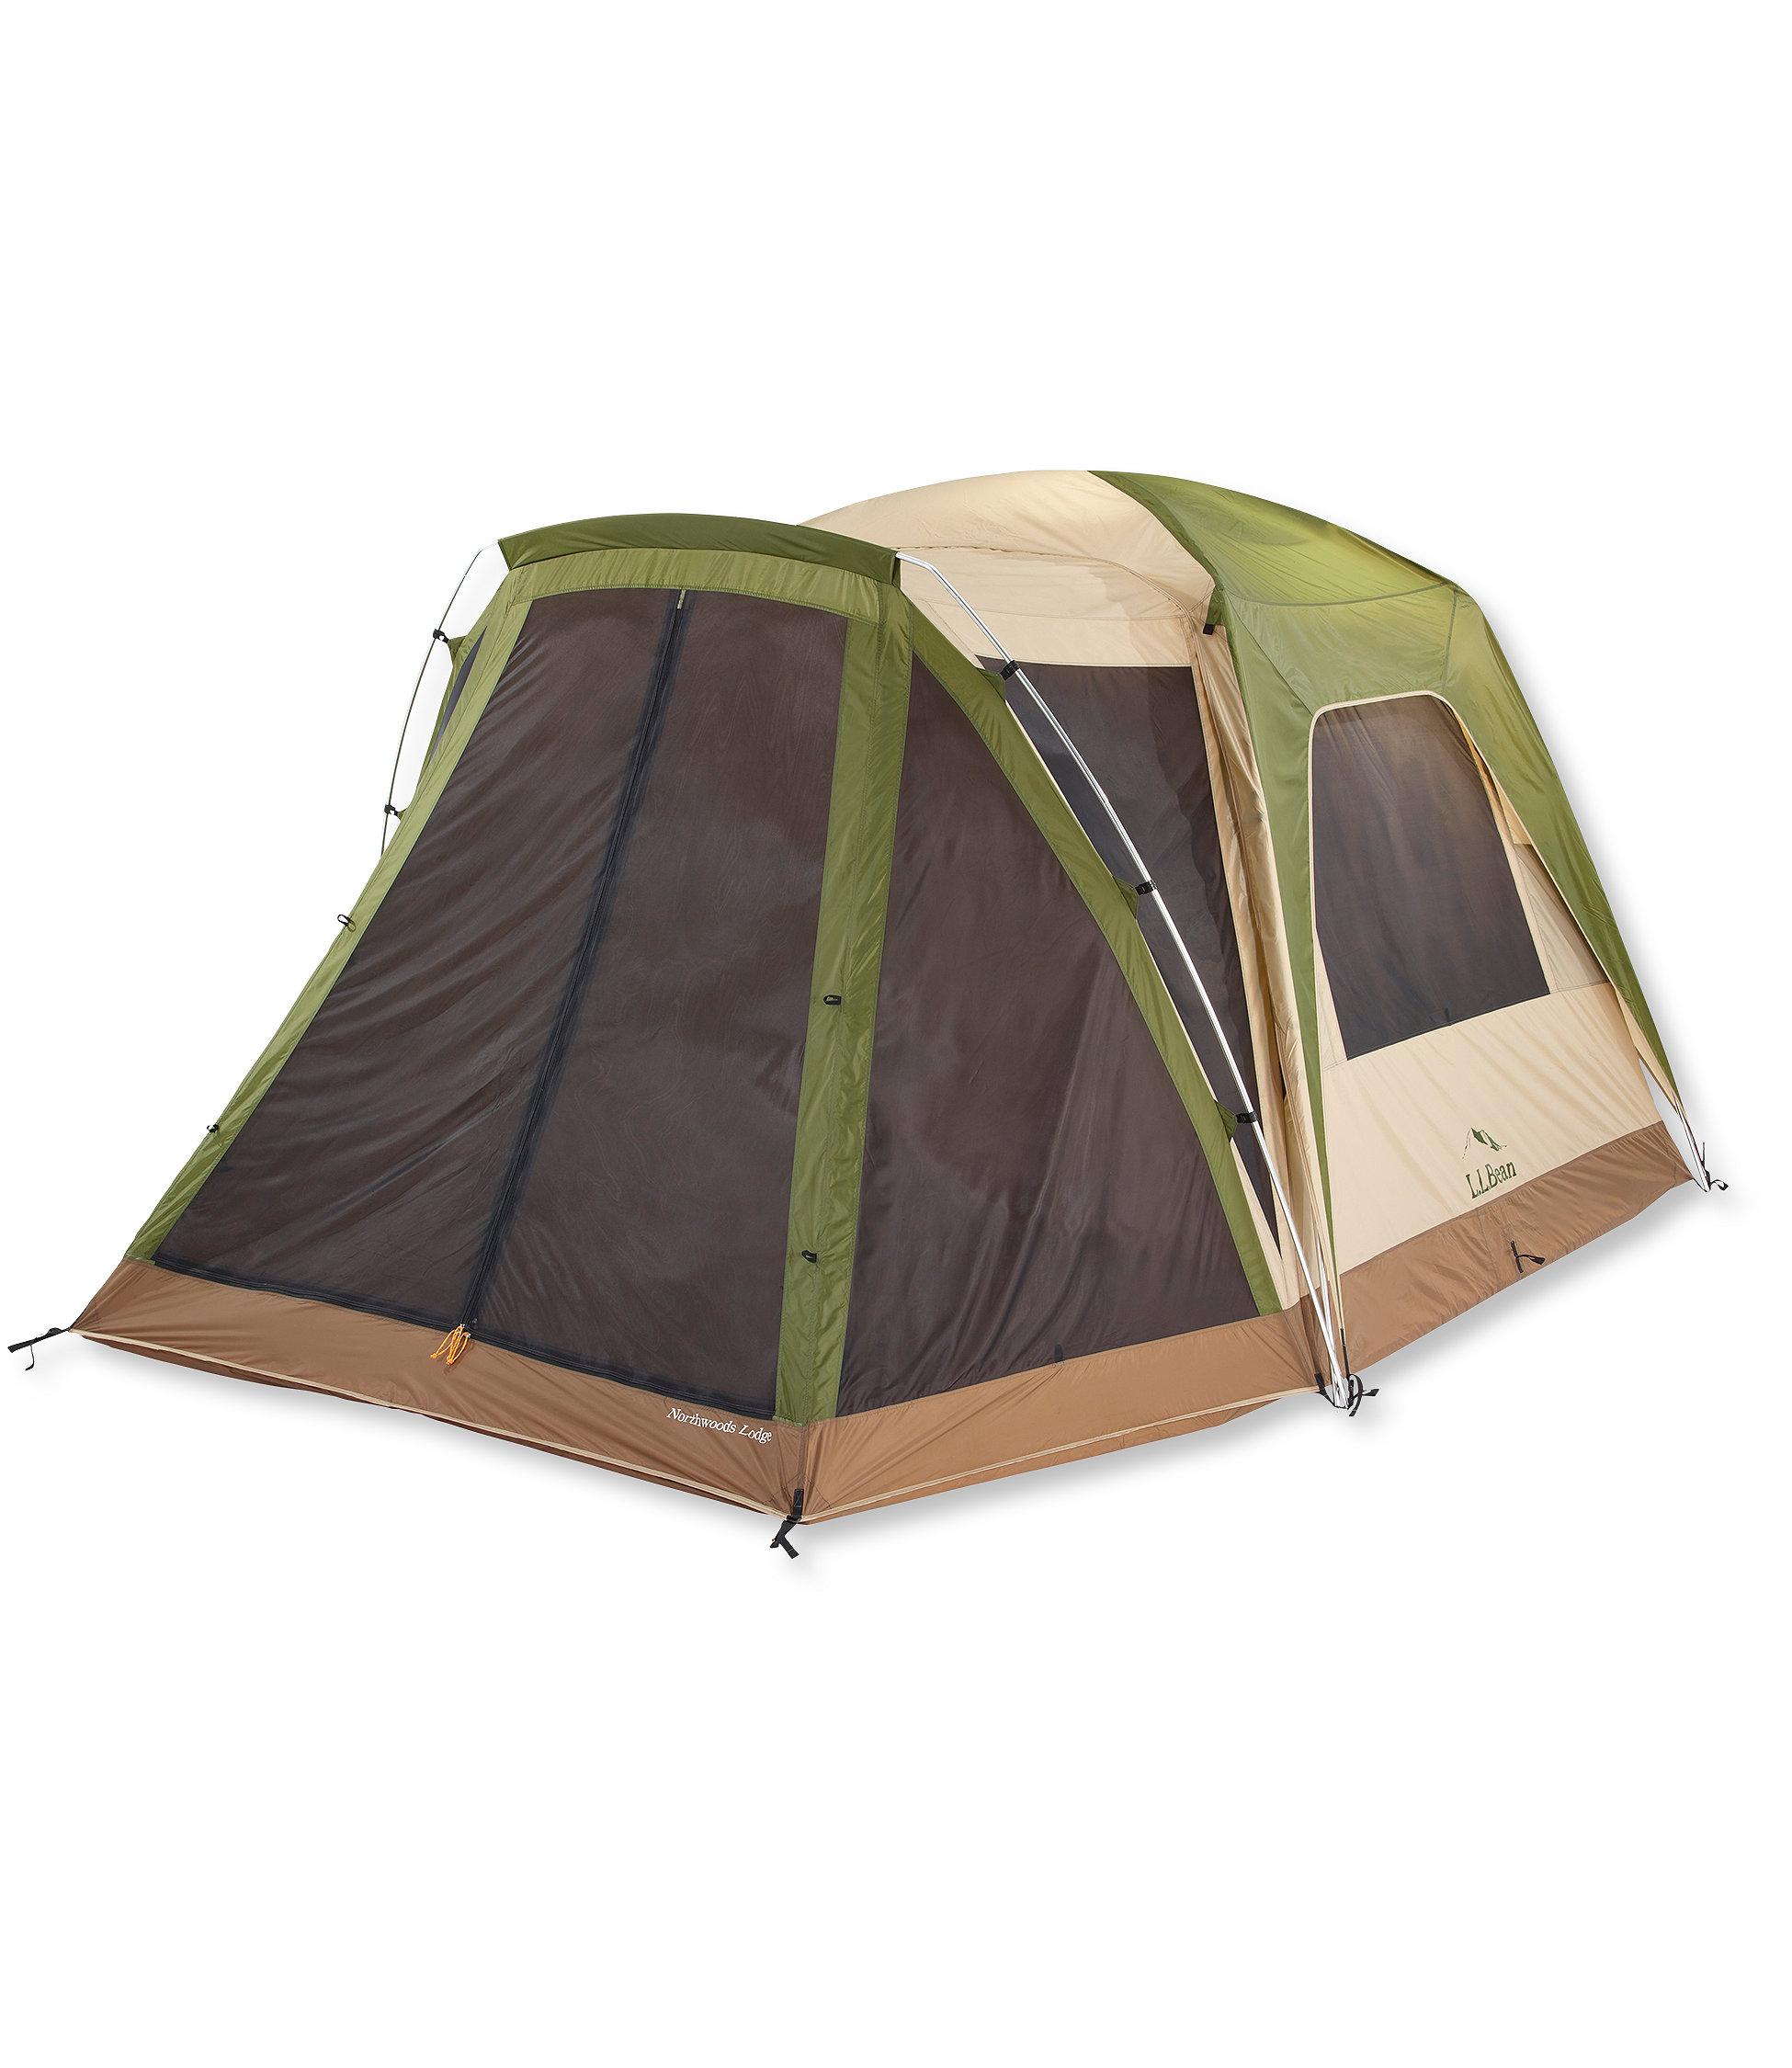 L.L.Bean Northwoods 6-Person Cabin Tent